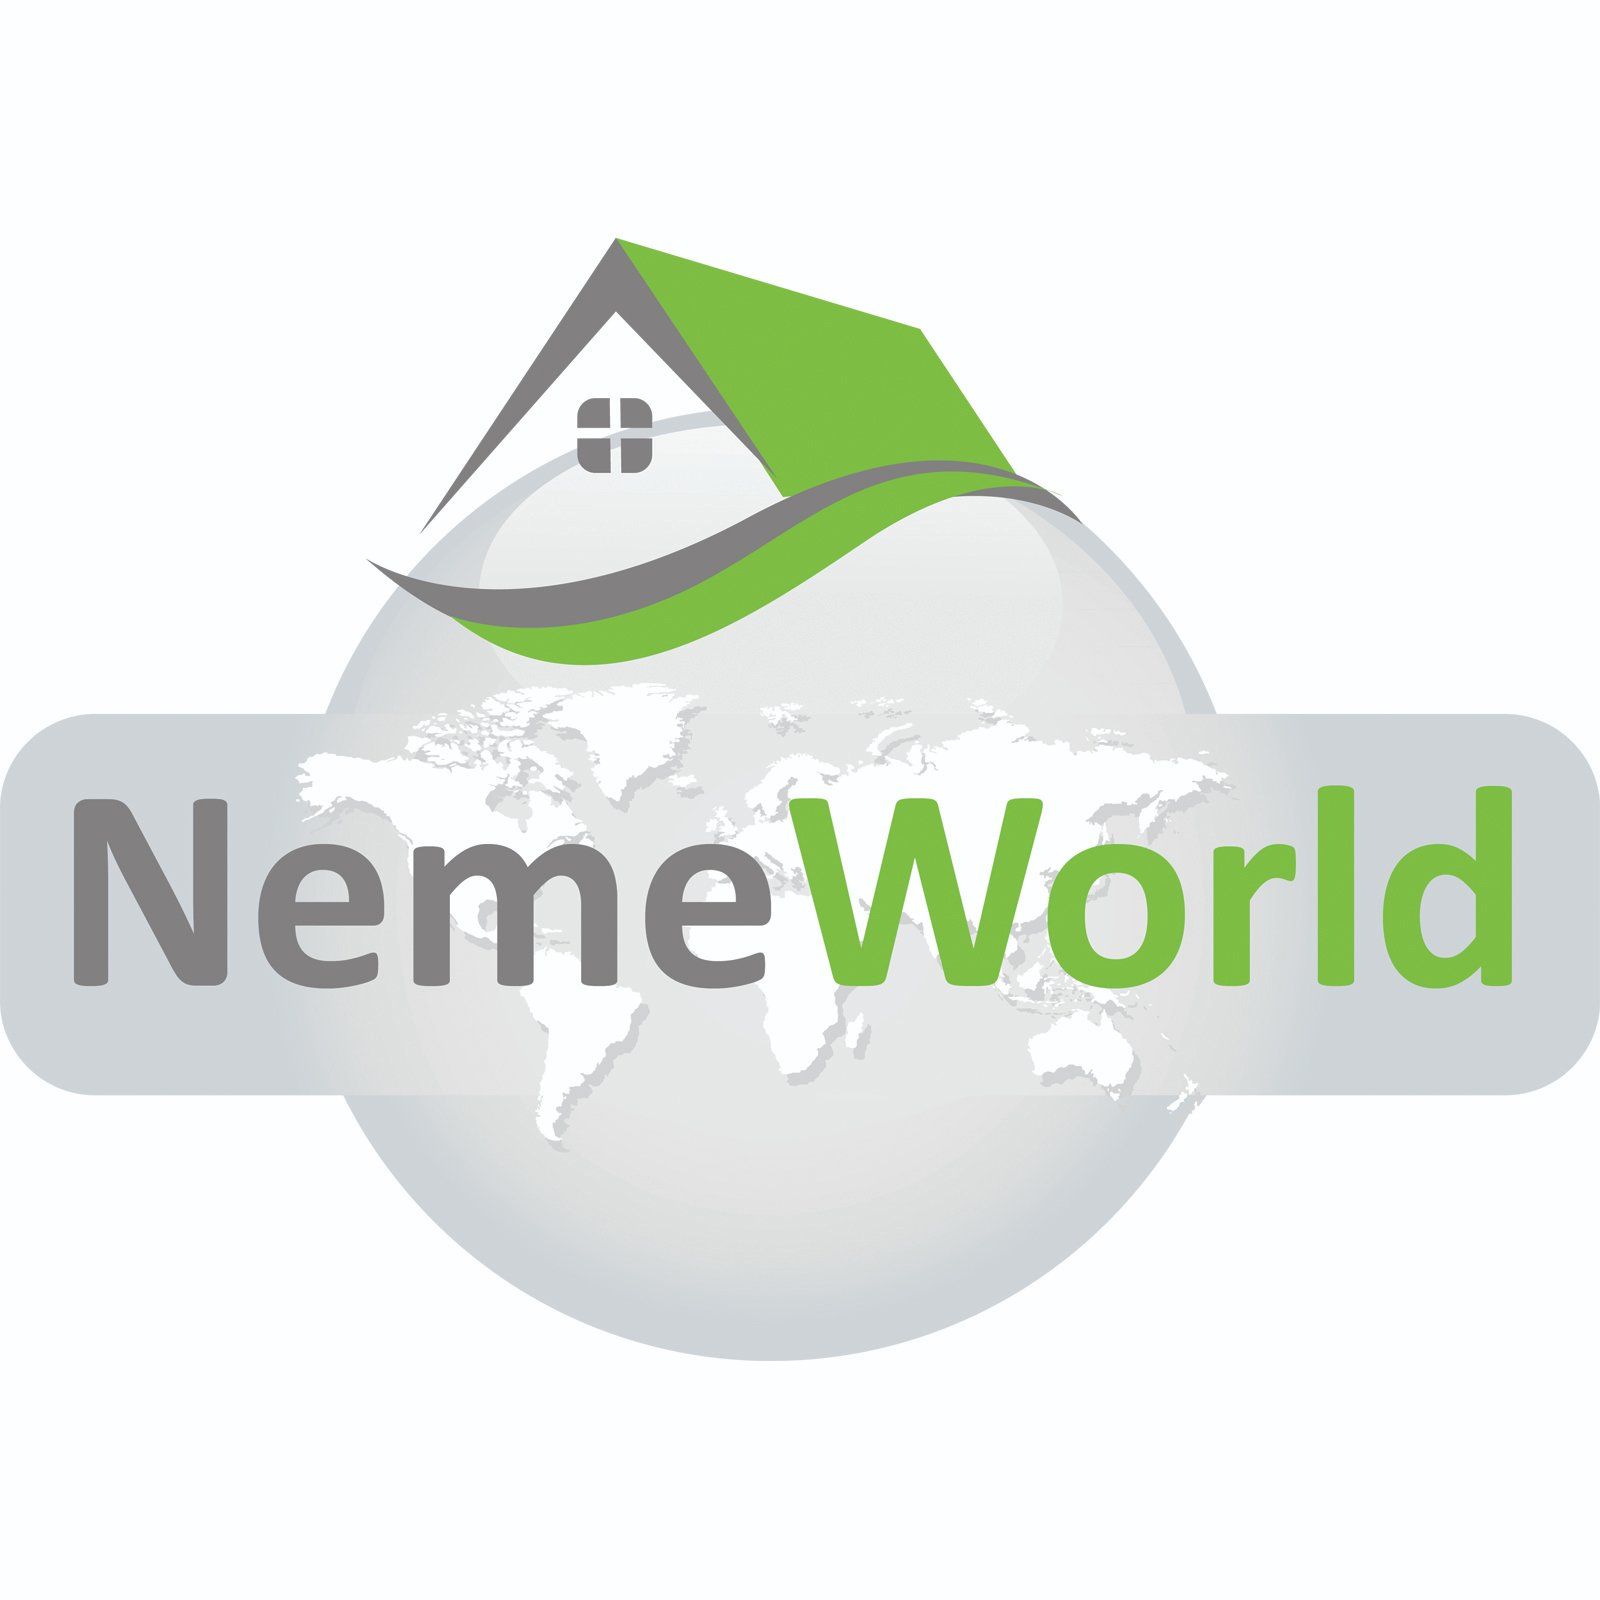 NemeWorld